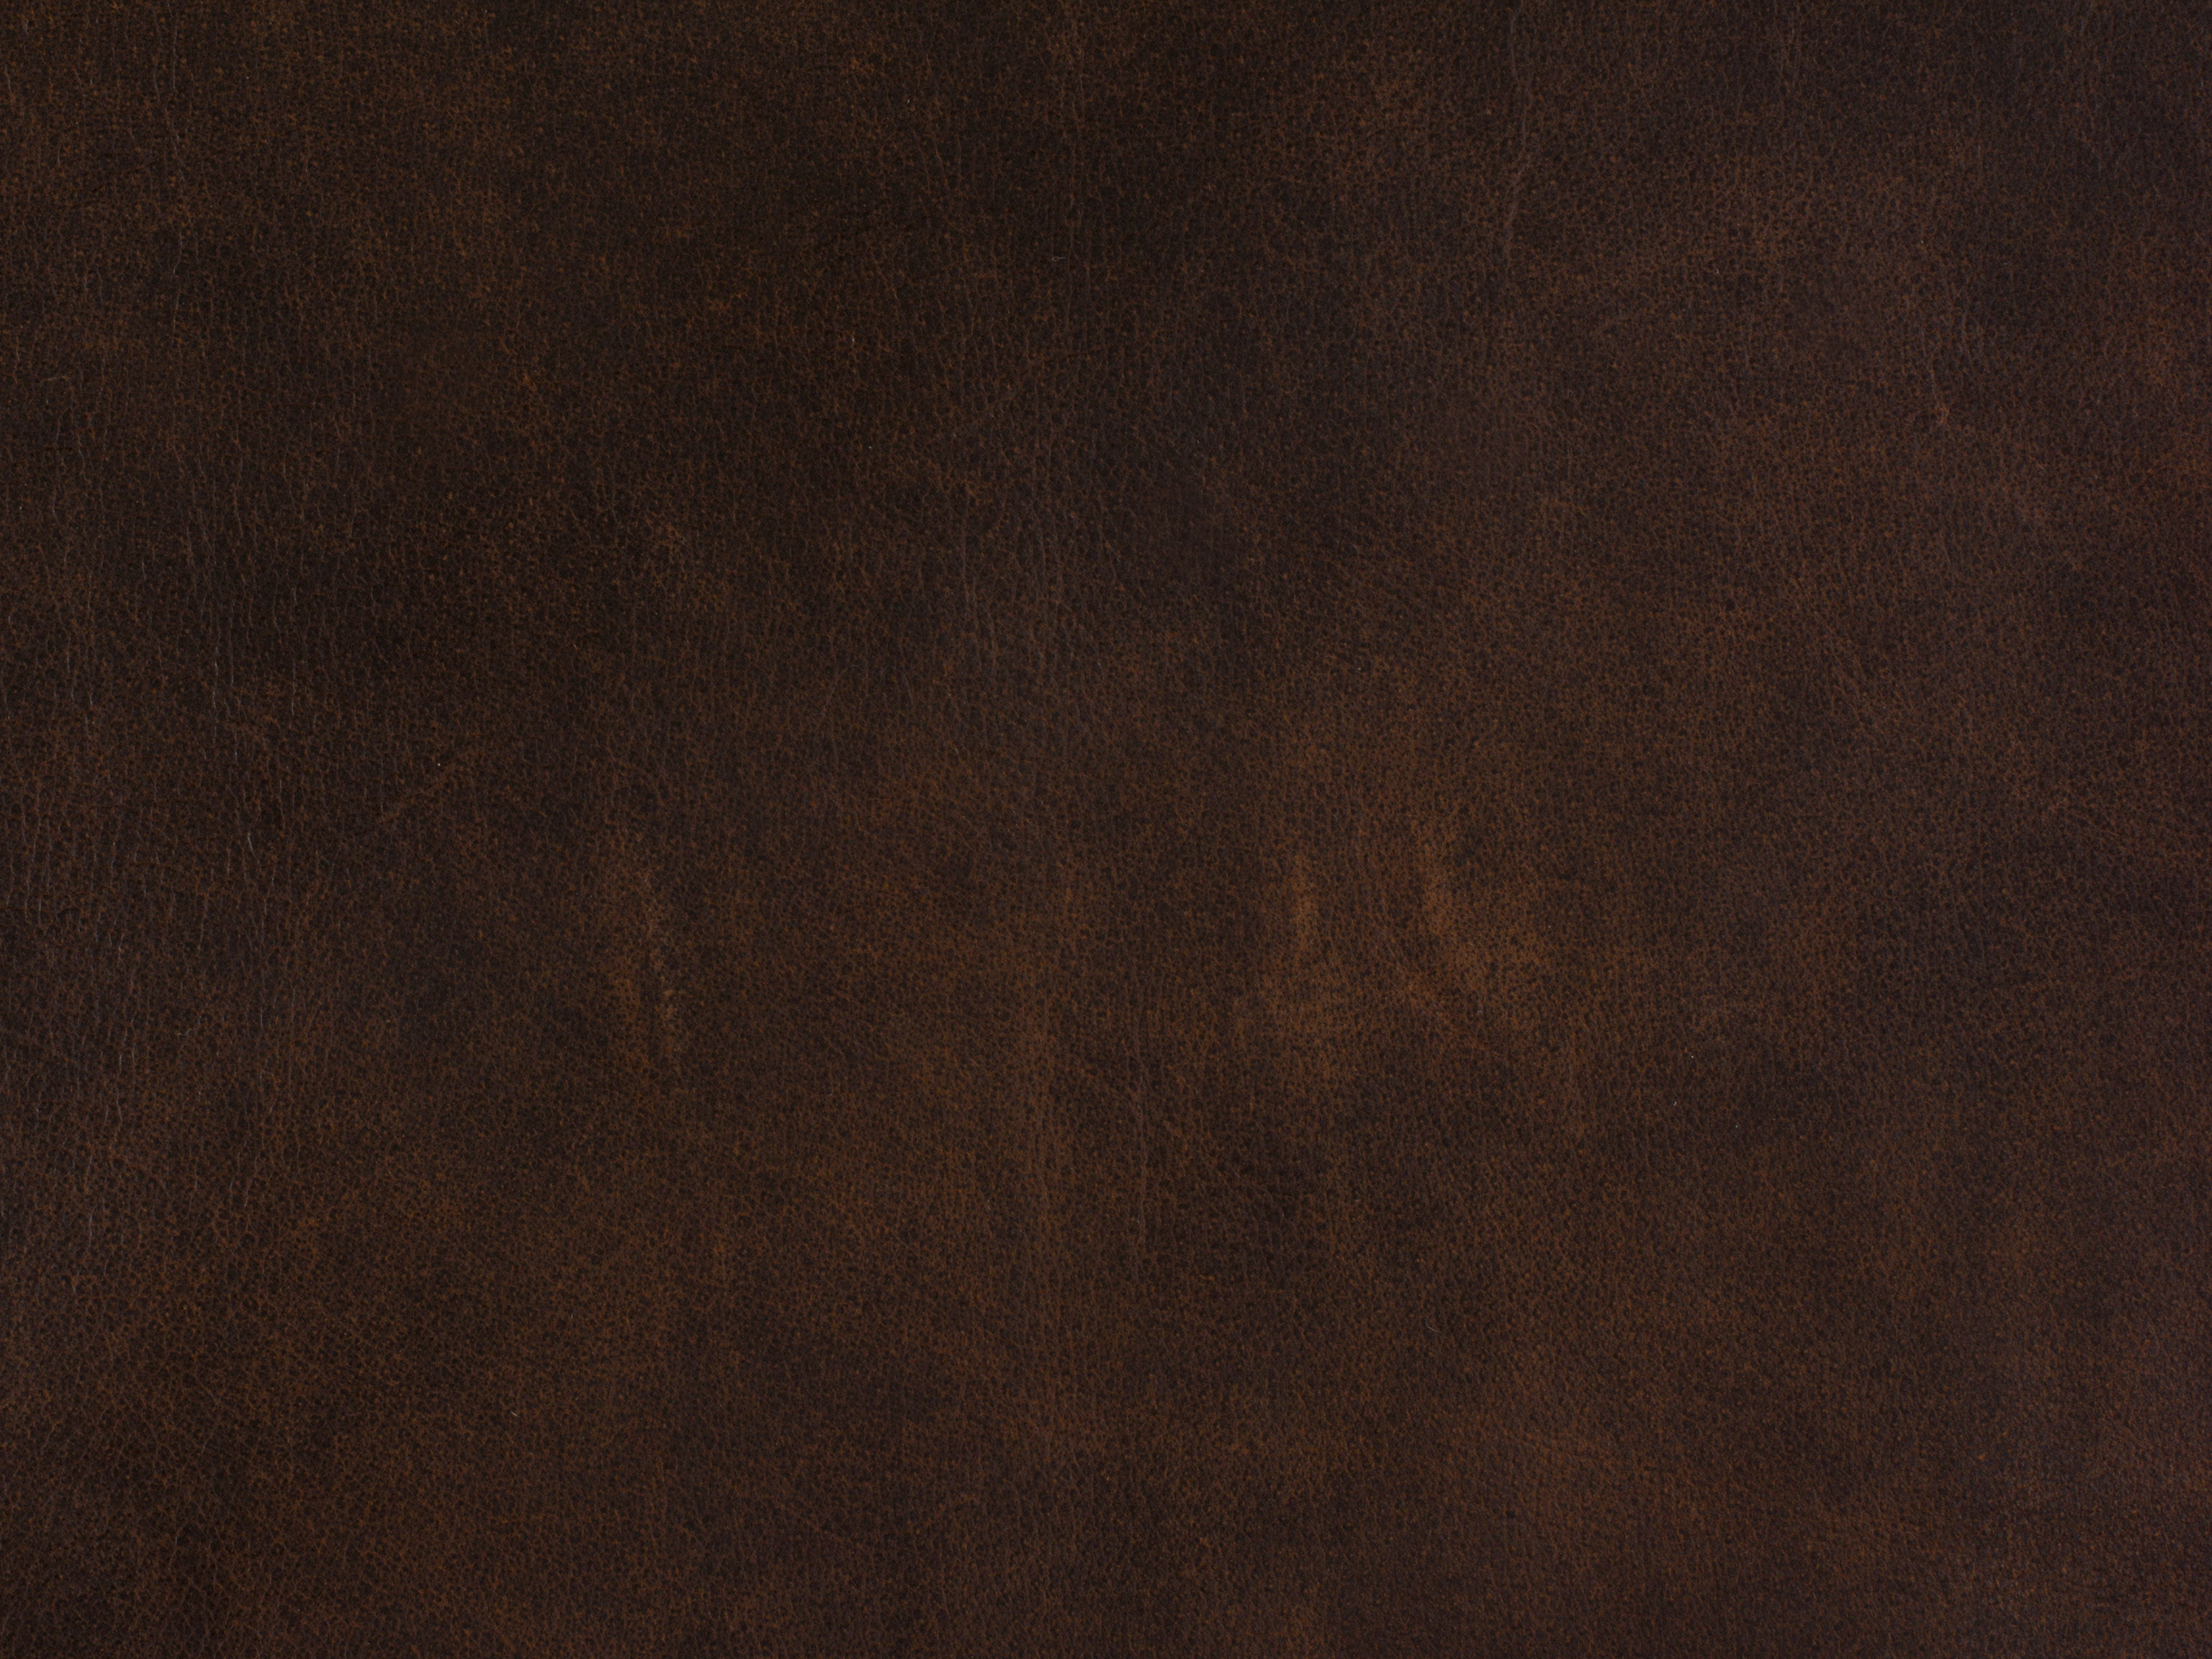 918700-88